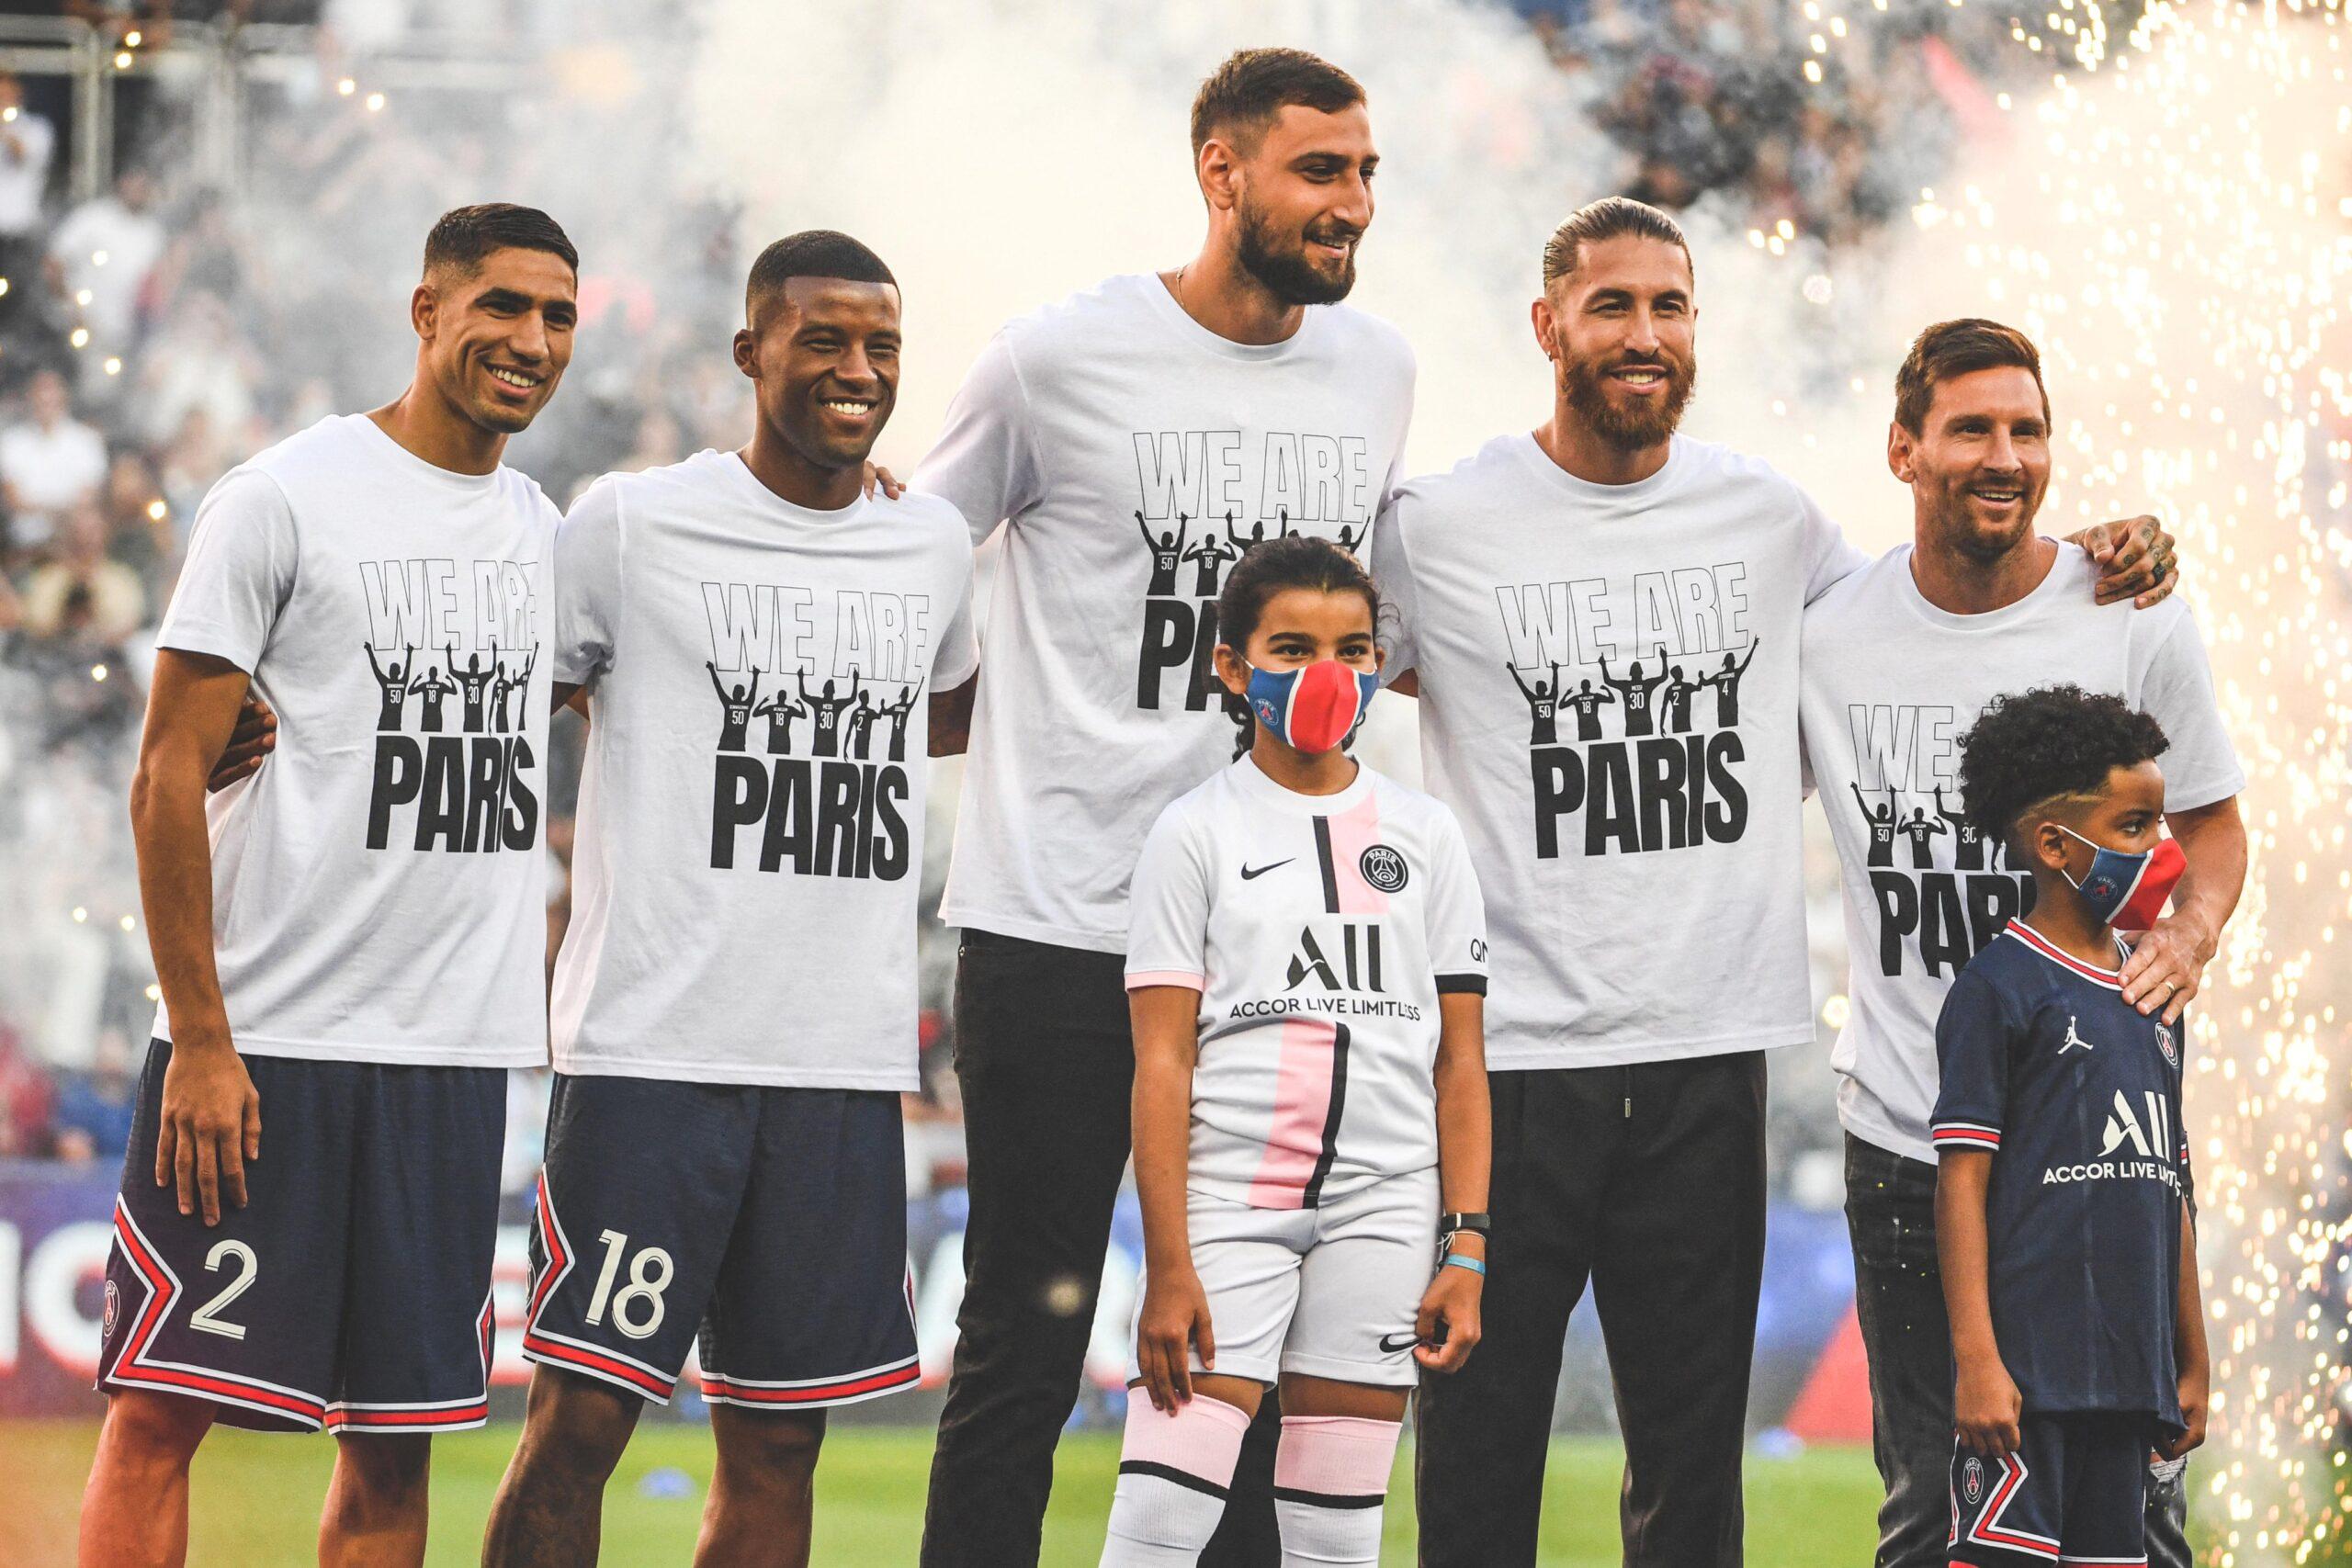 نجوم فريق باريس سان جيرمان الجدد